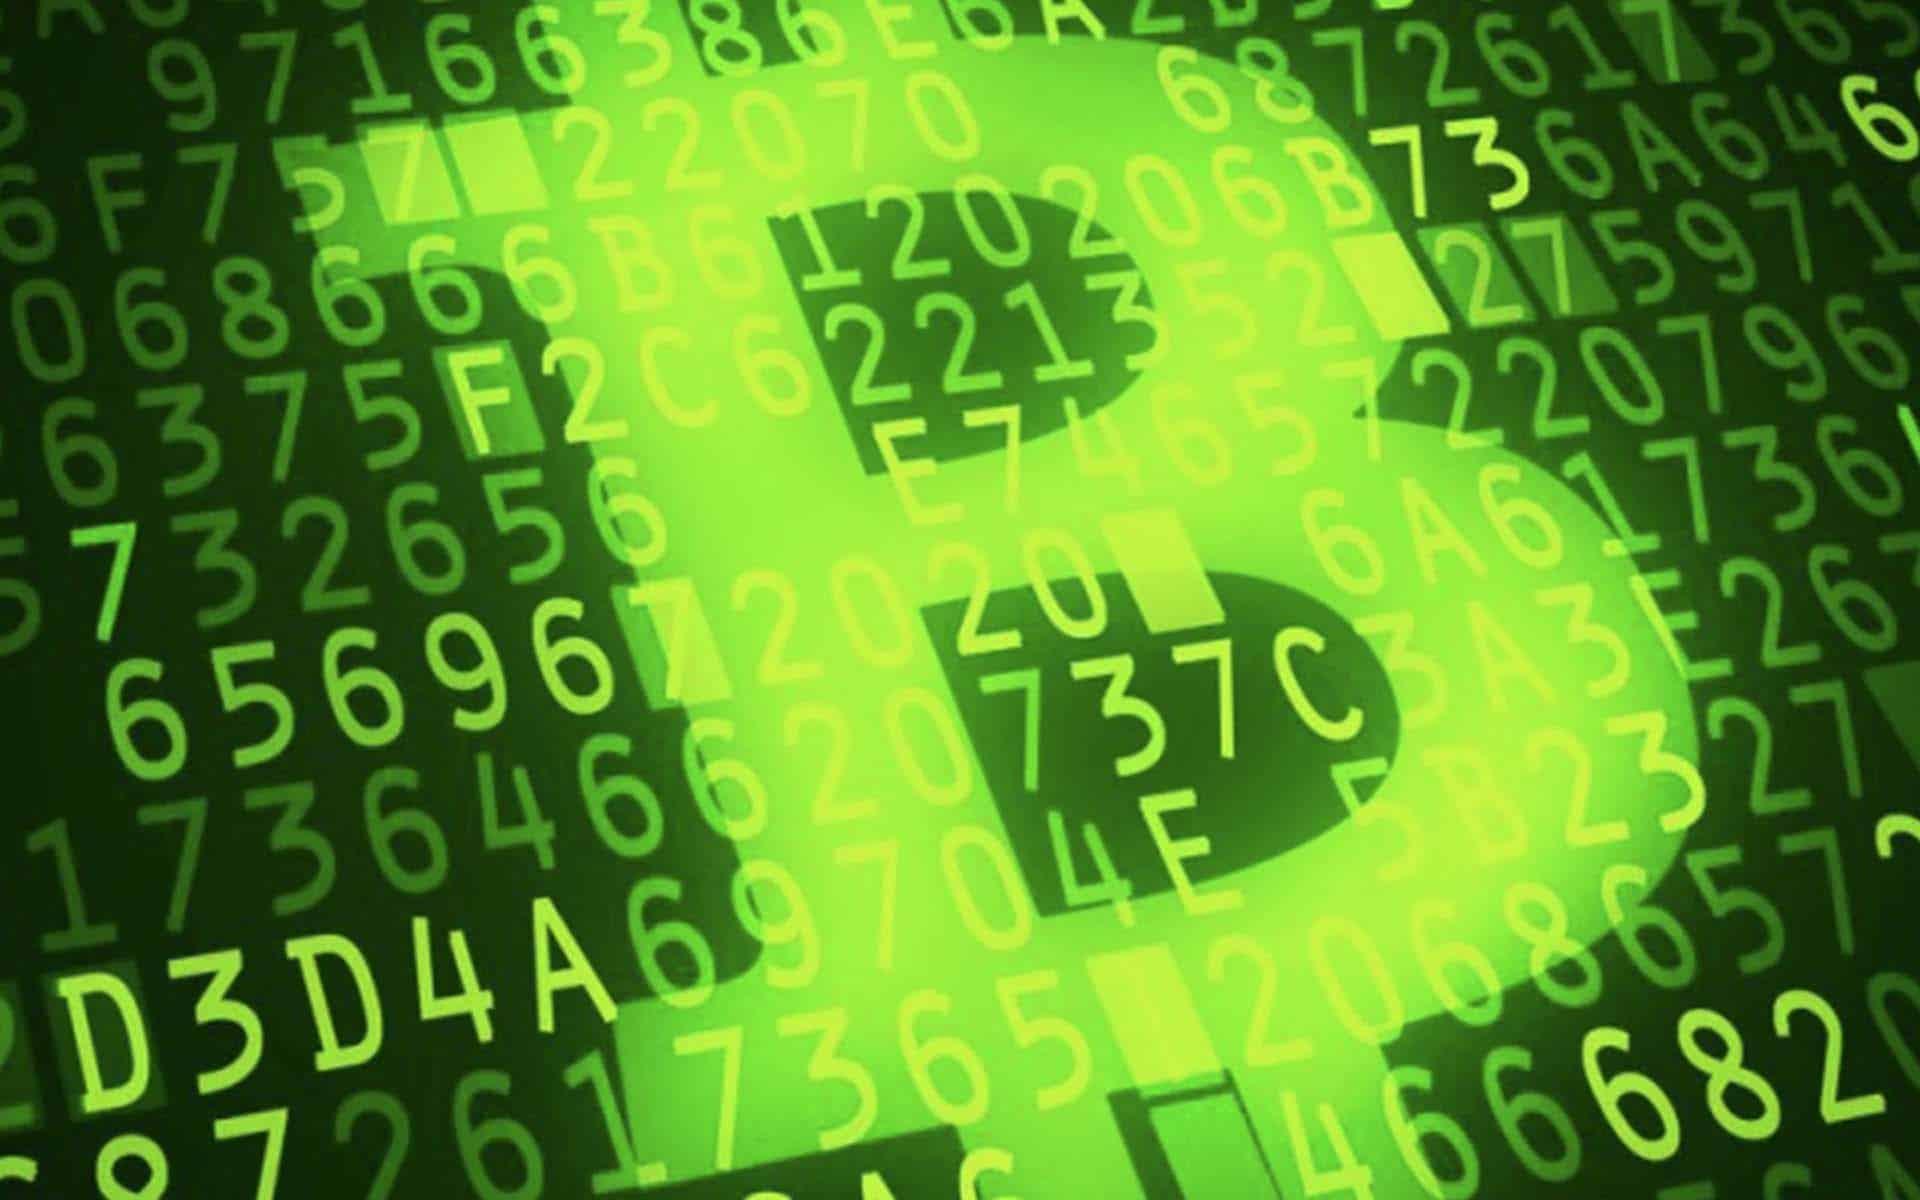 Roger Ver Announces a New $200 Million Bitcoin Cash Fund